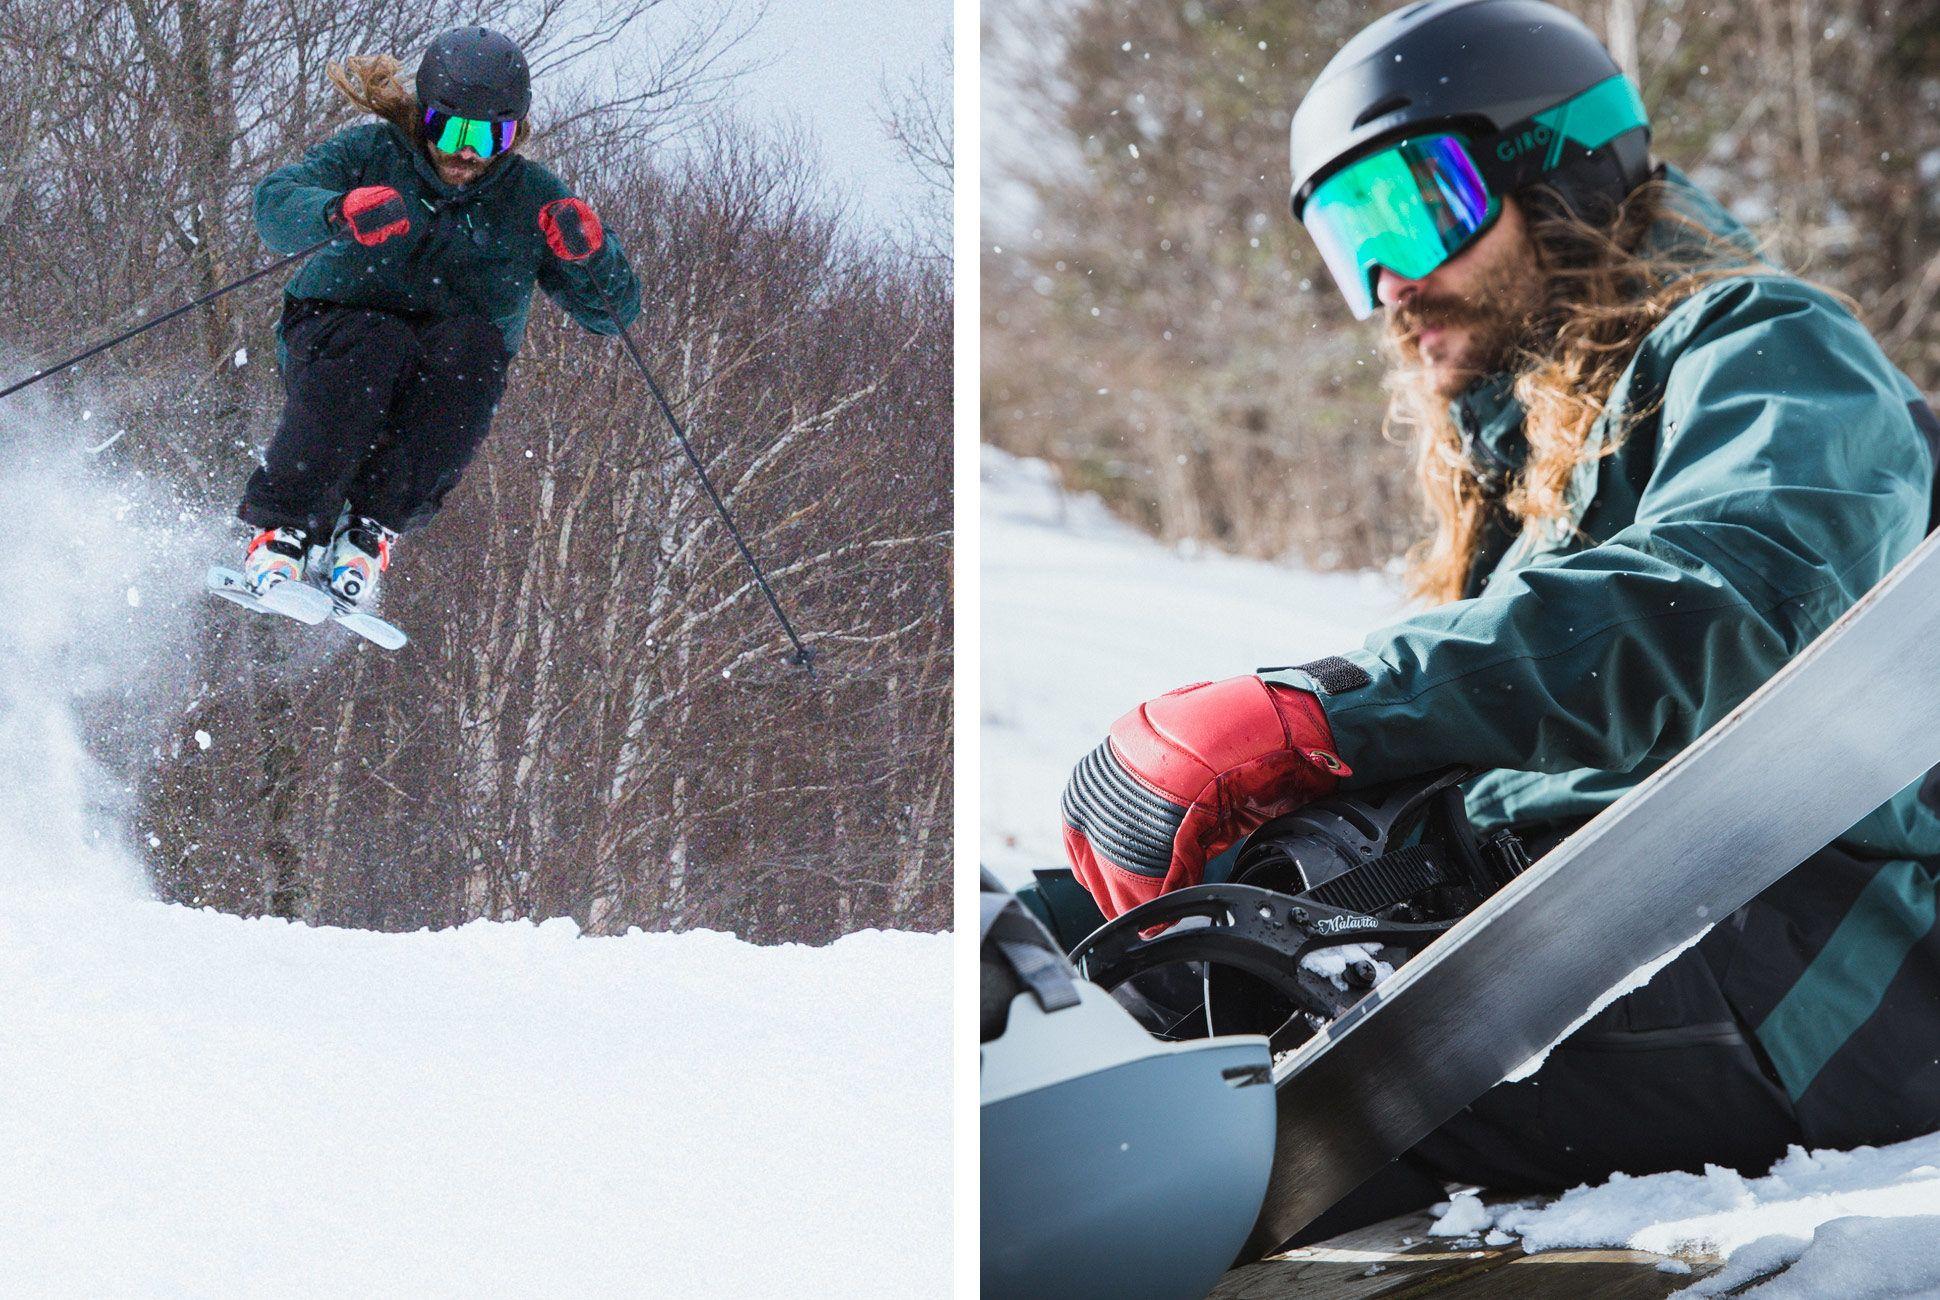 ultimate-ski-and-snow-gear-patrol-trew-slide-4